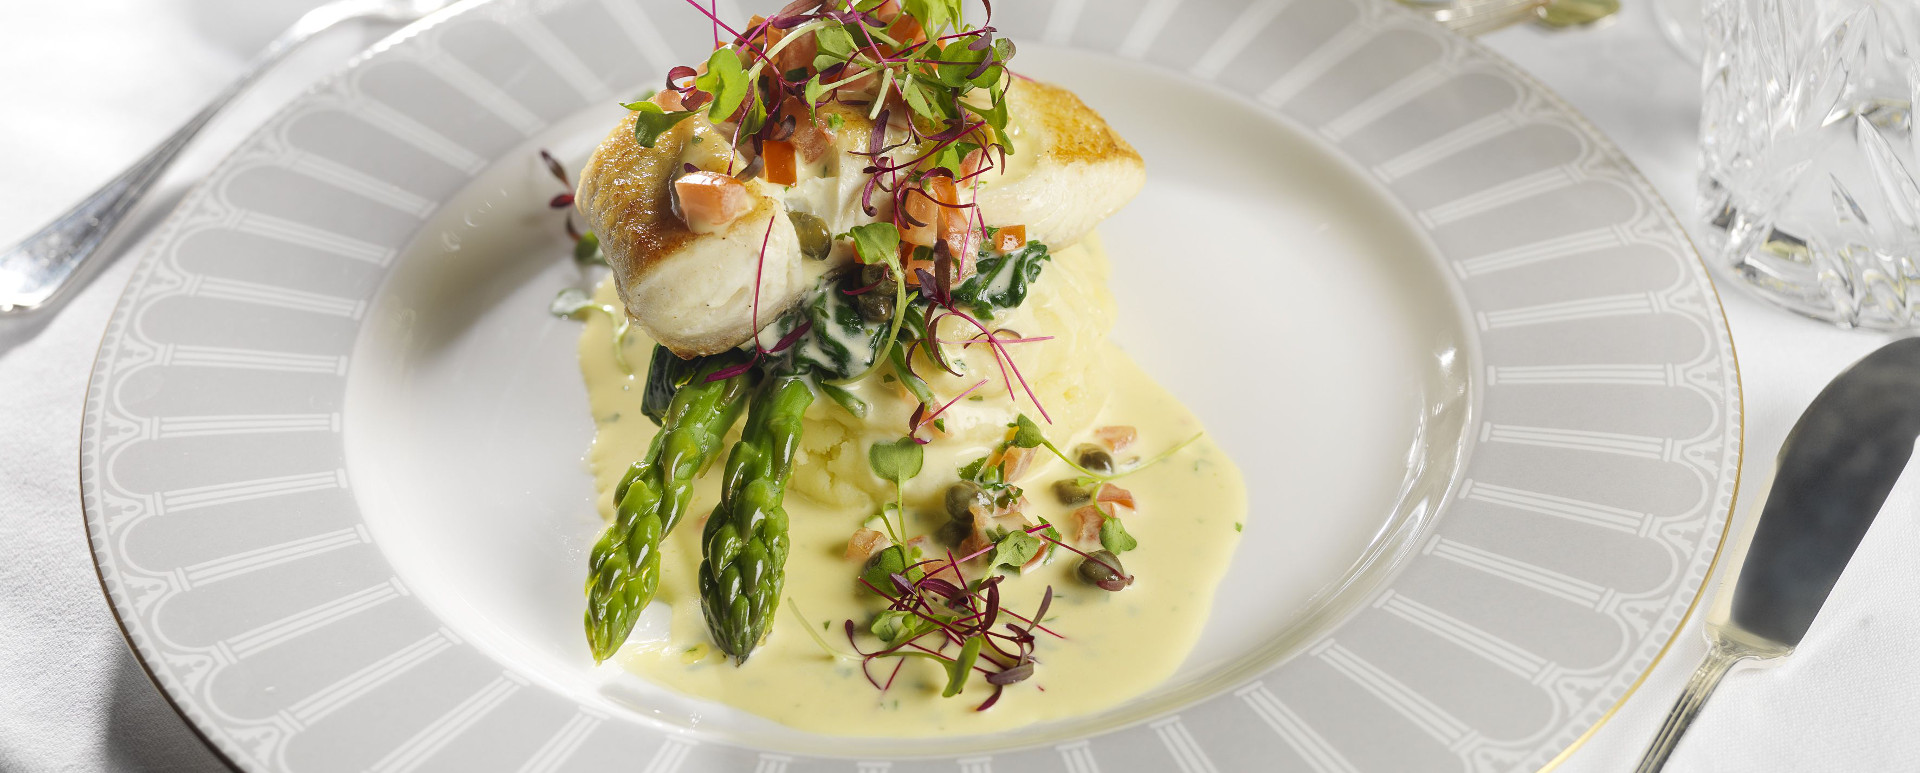 Wedding-main-course-fish-option